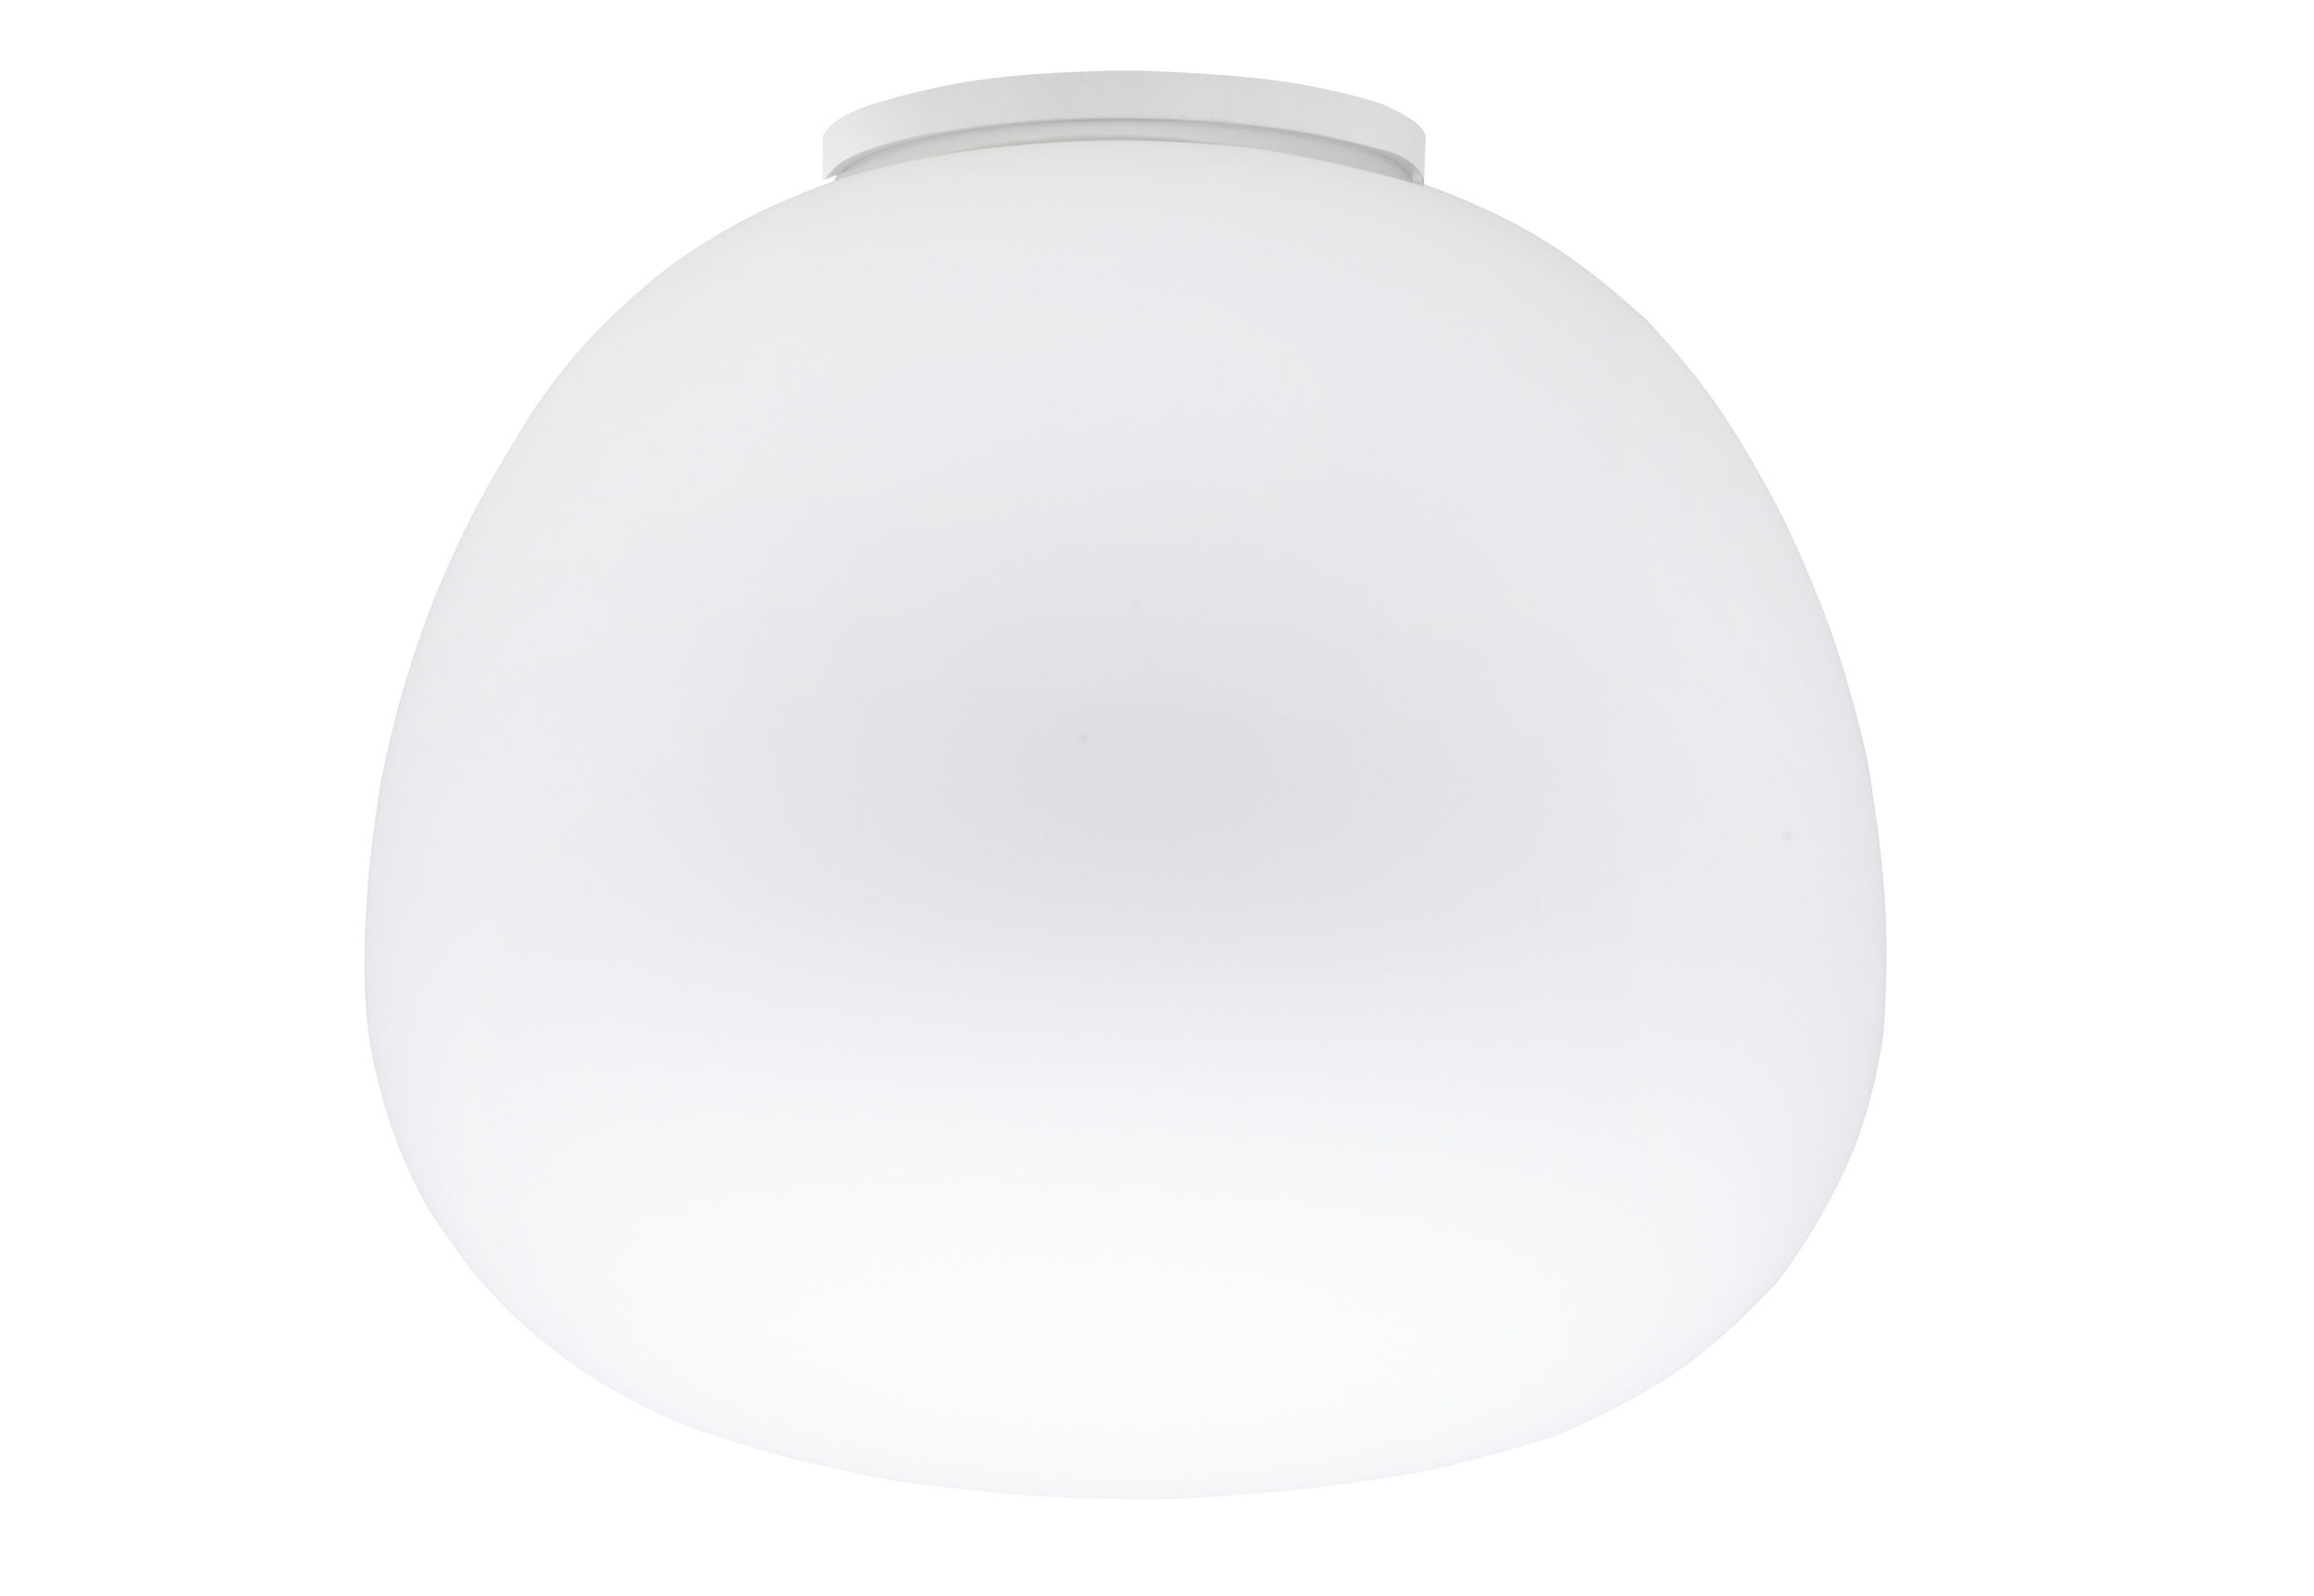 Lighting - Ceiling Lights - Mochi Ceiling light - Ø 45 cm by Fabbian - White - Ø 45 cm - Glass